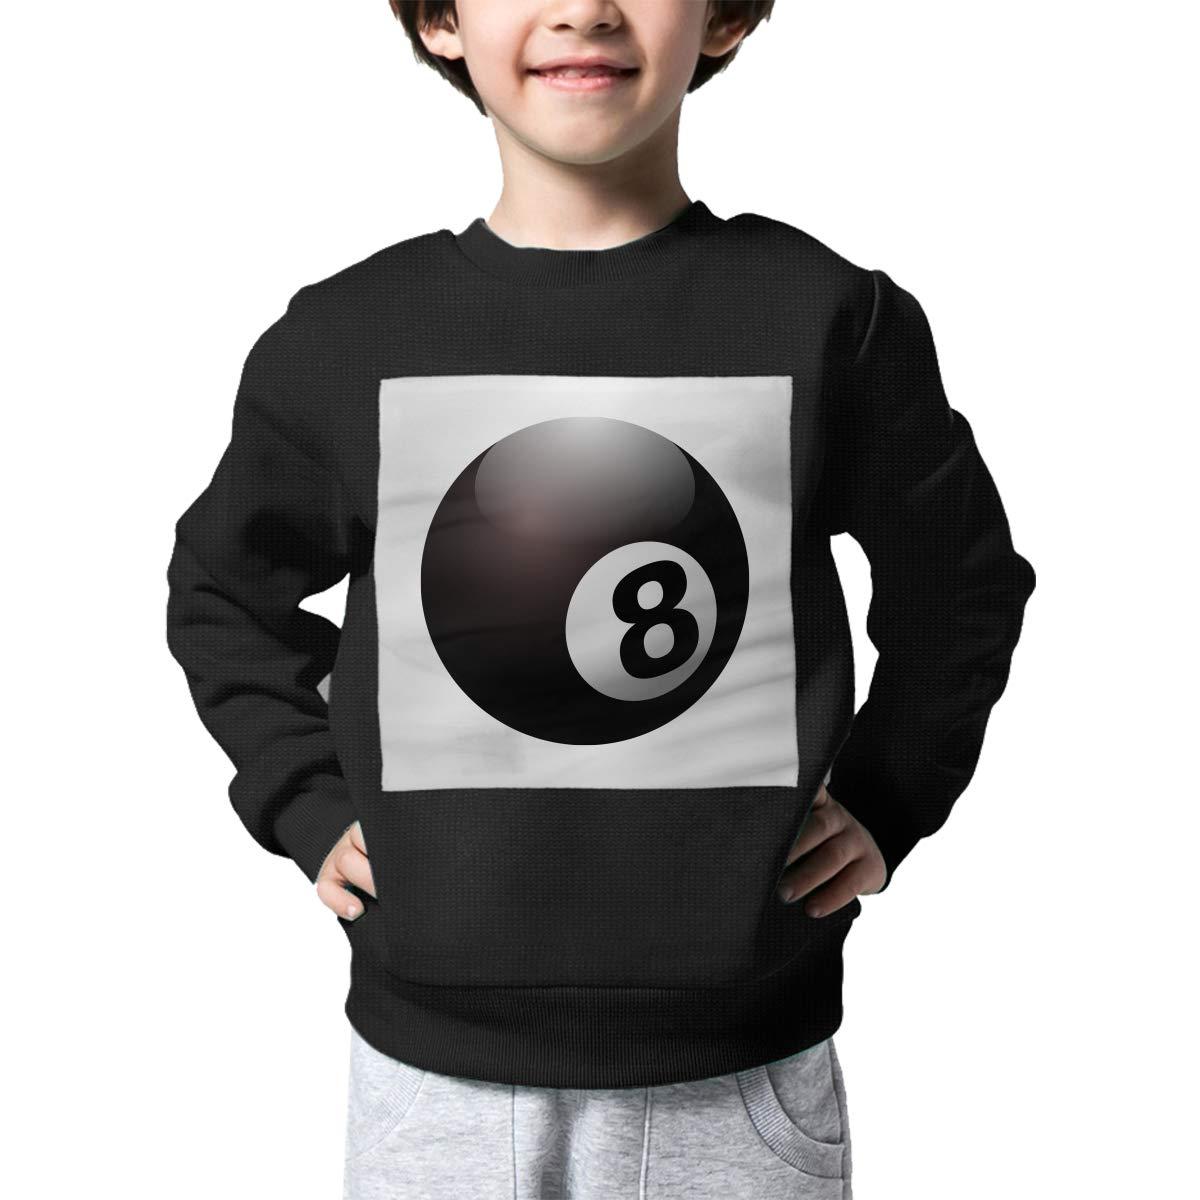 AW-KOCP Childrens Billiard Sweater Baby Boys Outerwear